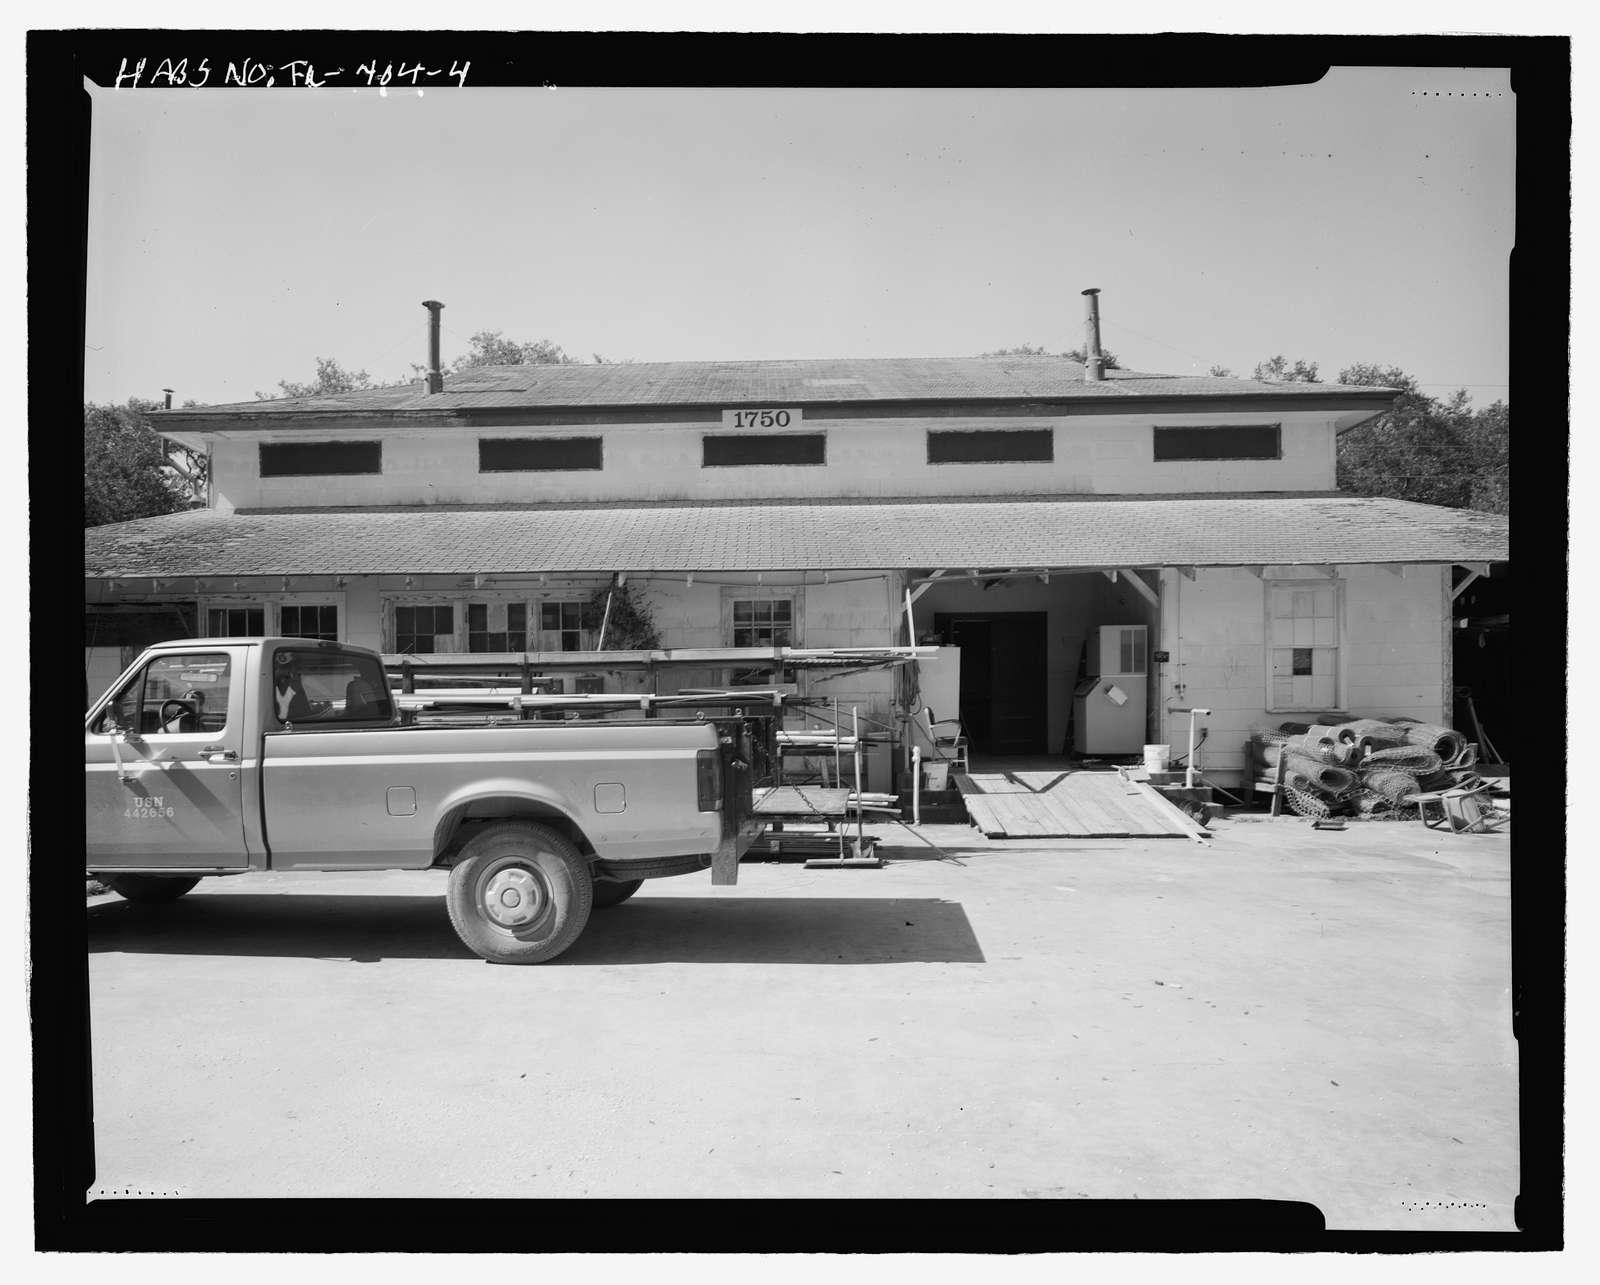 U.S. Naval Air Station, Assembly Hall, Radford Boulevard, Pensacola, Escambia County, FL